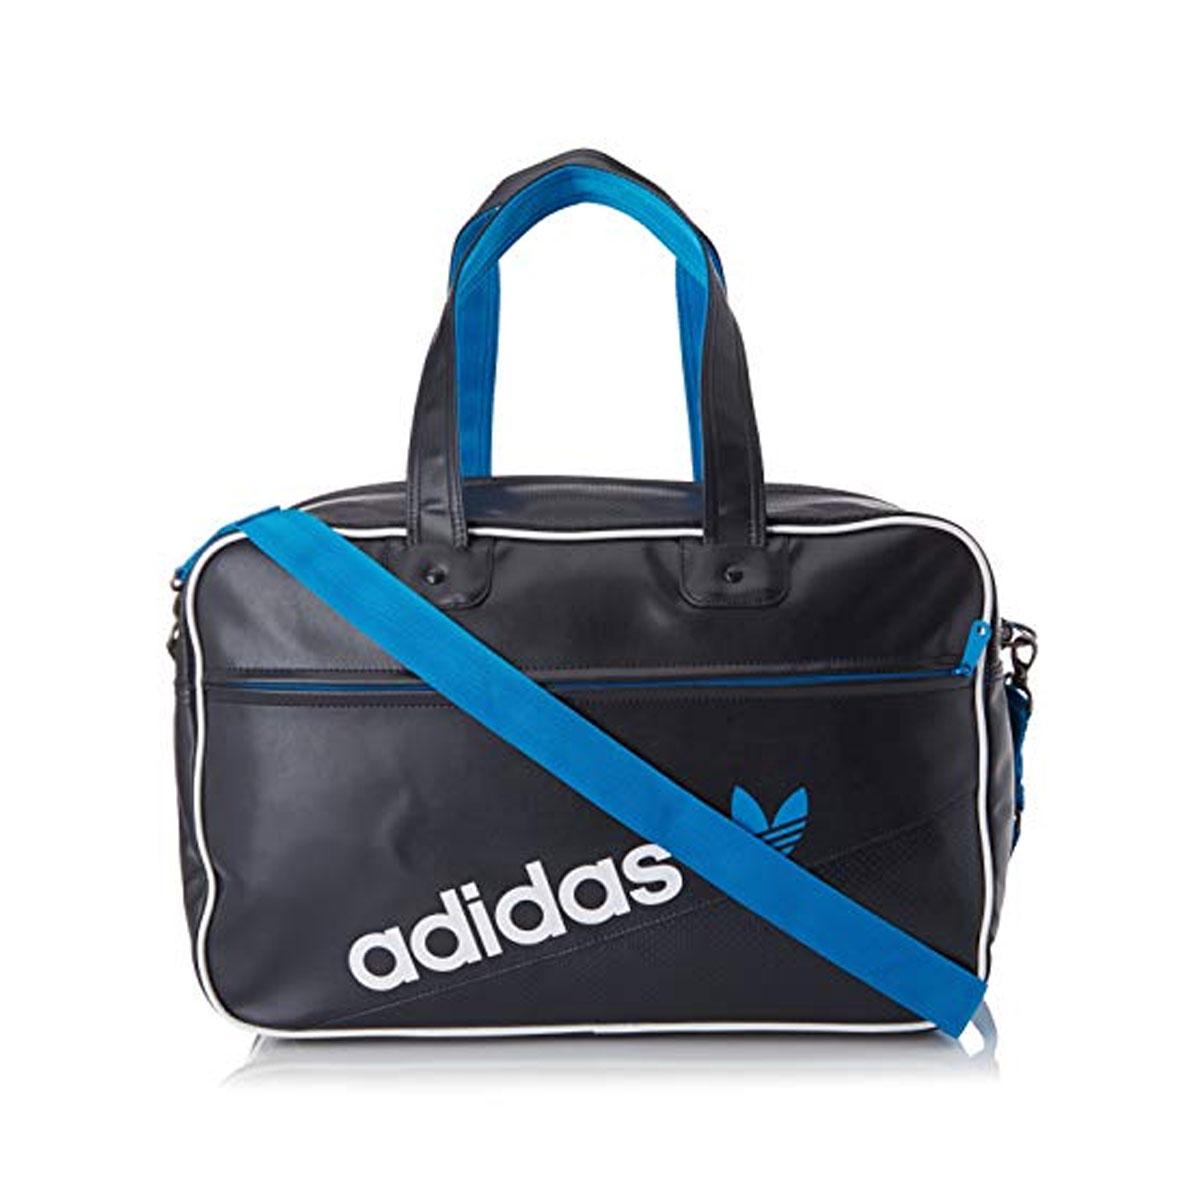 Adidas Originals Holdall Perforated